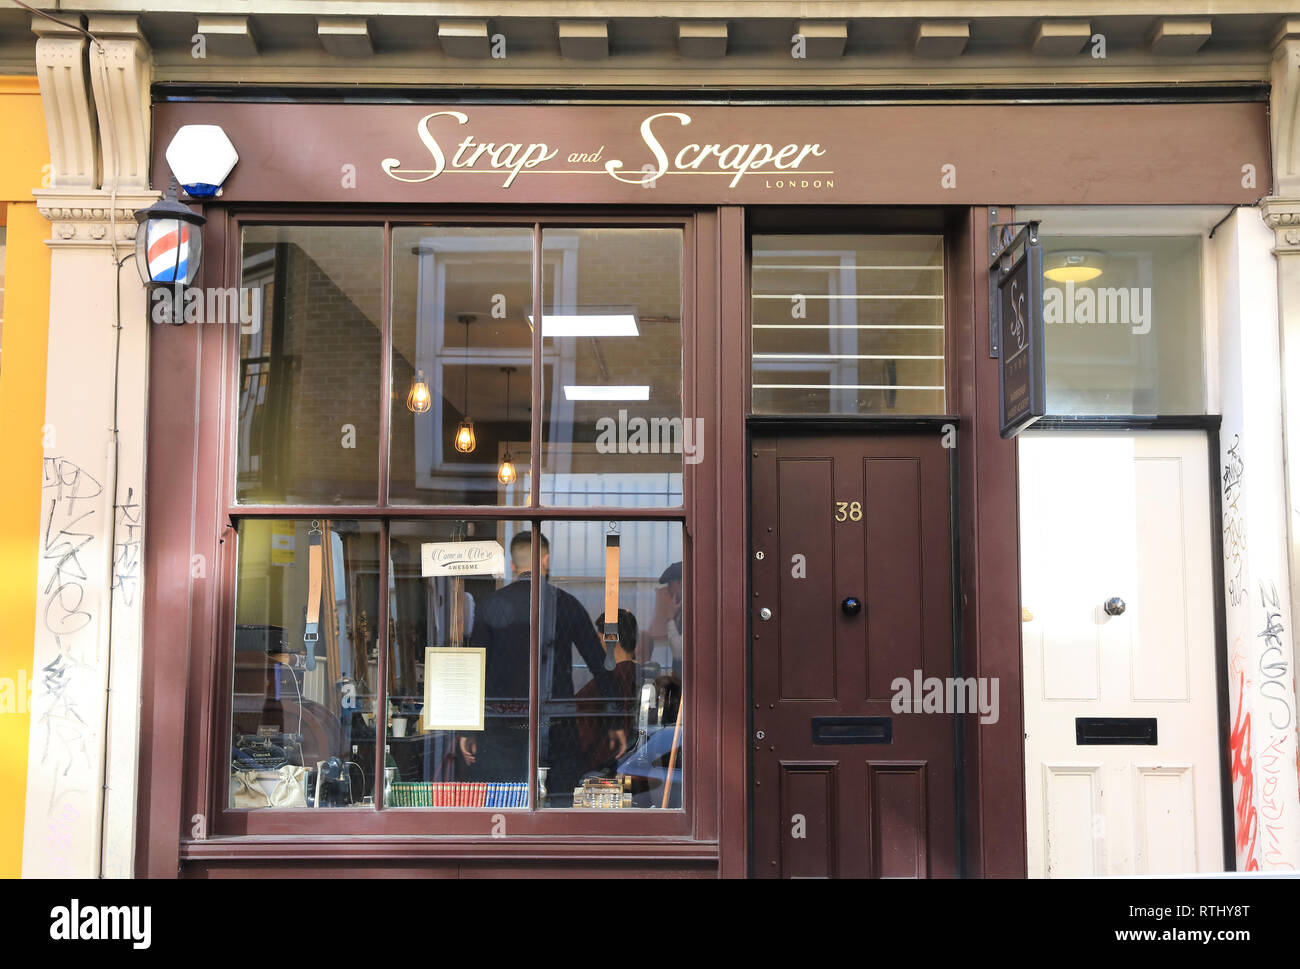 40ef19fcbdd1 London City Barber Shop Stock Photos   London City Barber Shop Stock ...